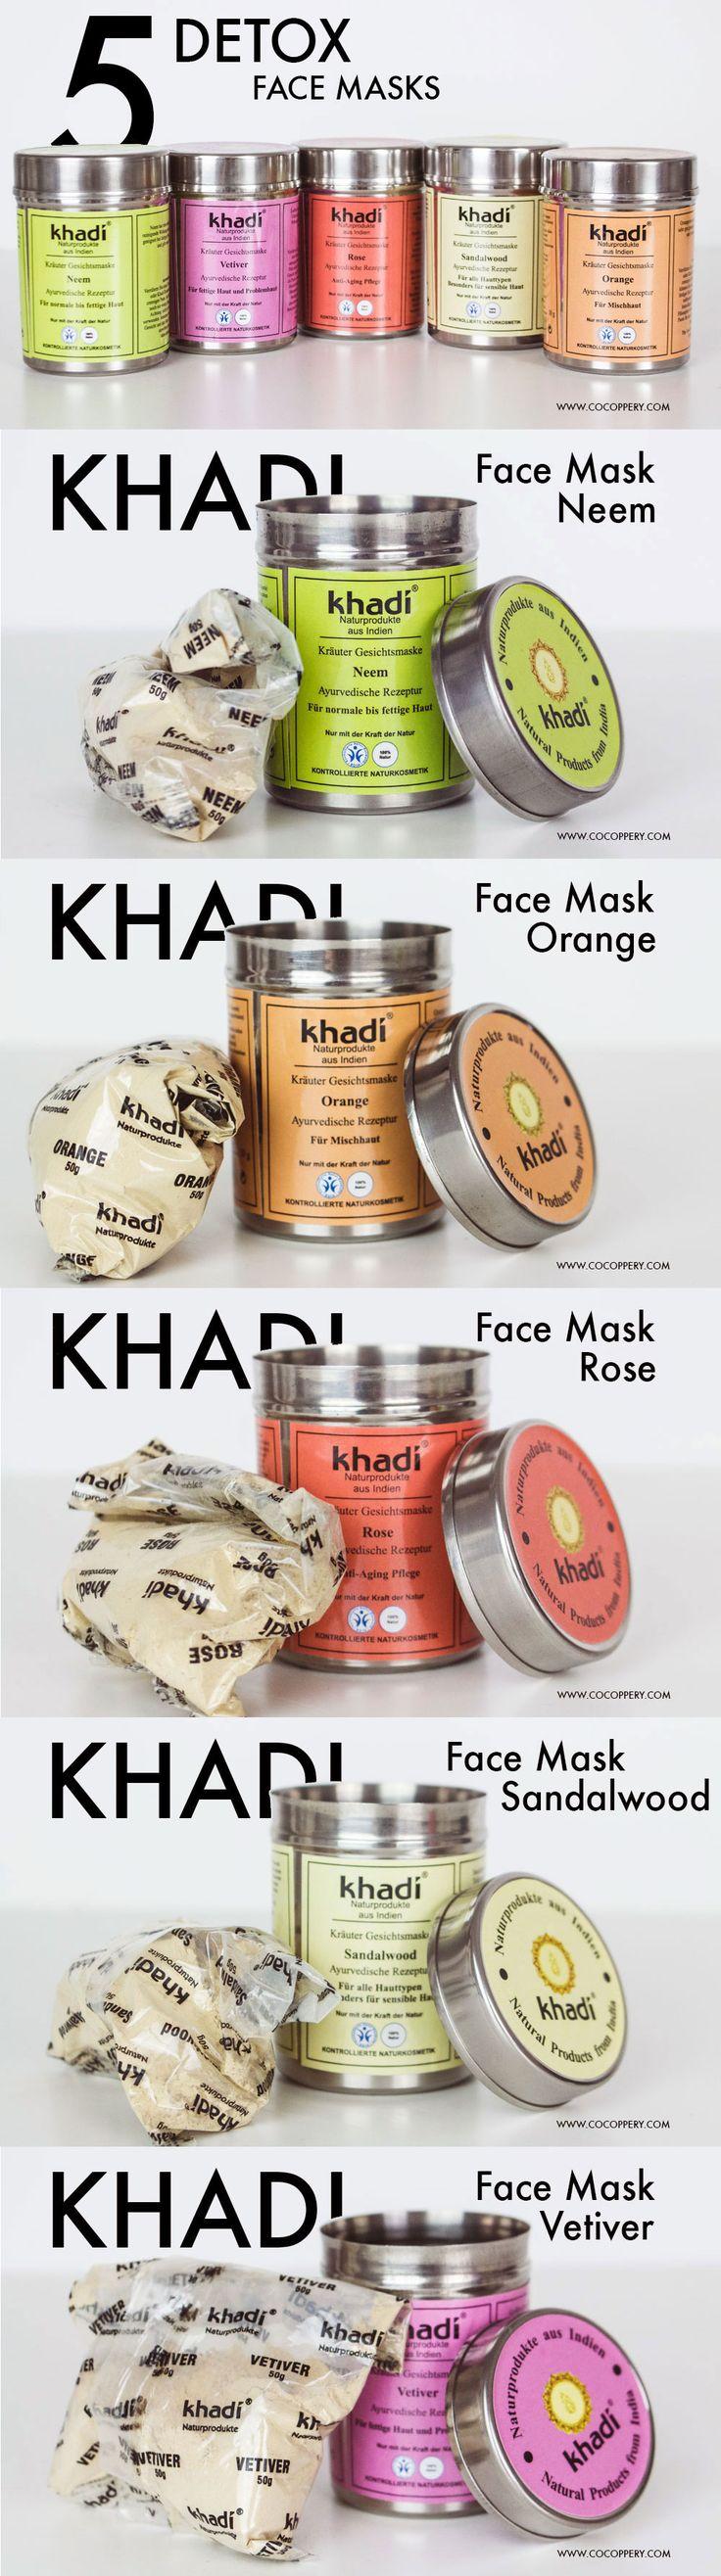 Check out Khadi's wonderful all-natural, herbal face masks & read the review! Khadi Neem, Khadi Vetiver, Khadi Rose, Khadi Sandalwood Powders / Pulver ♡ Cocoppery